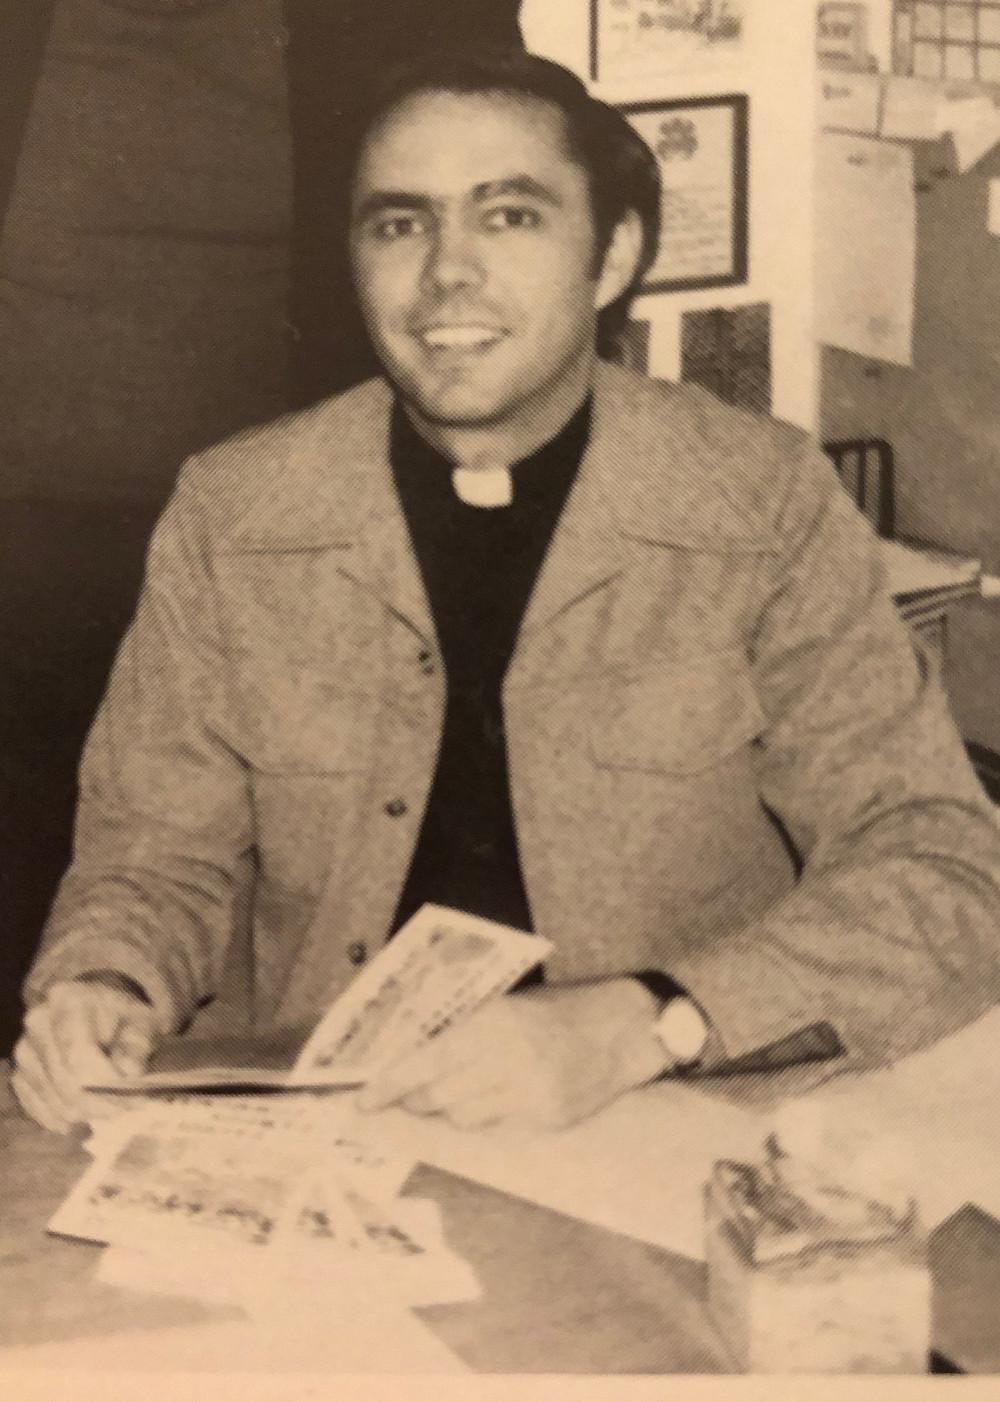 1978: Fr. Jack Hanna, University of St. Thomas yearbook, The Summa